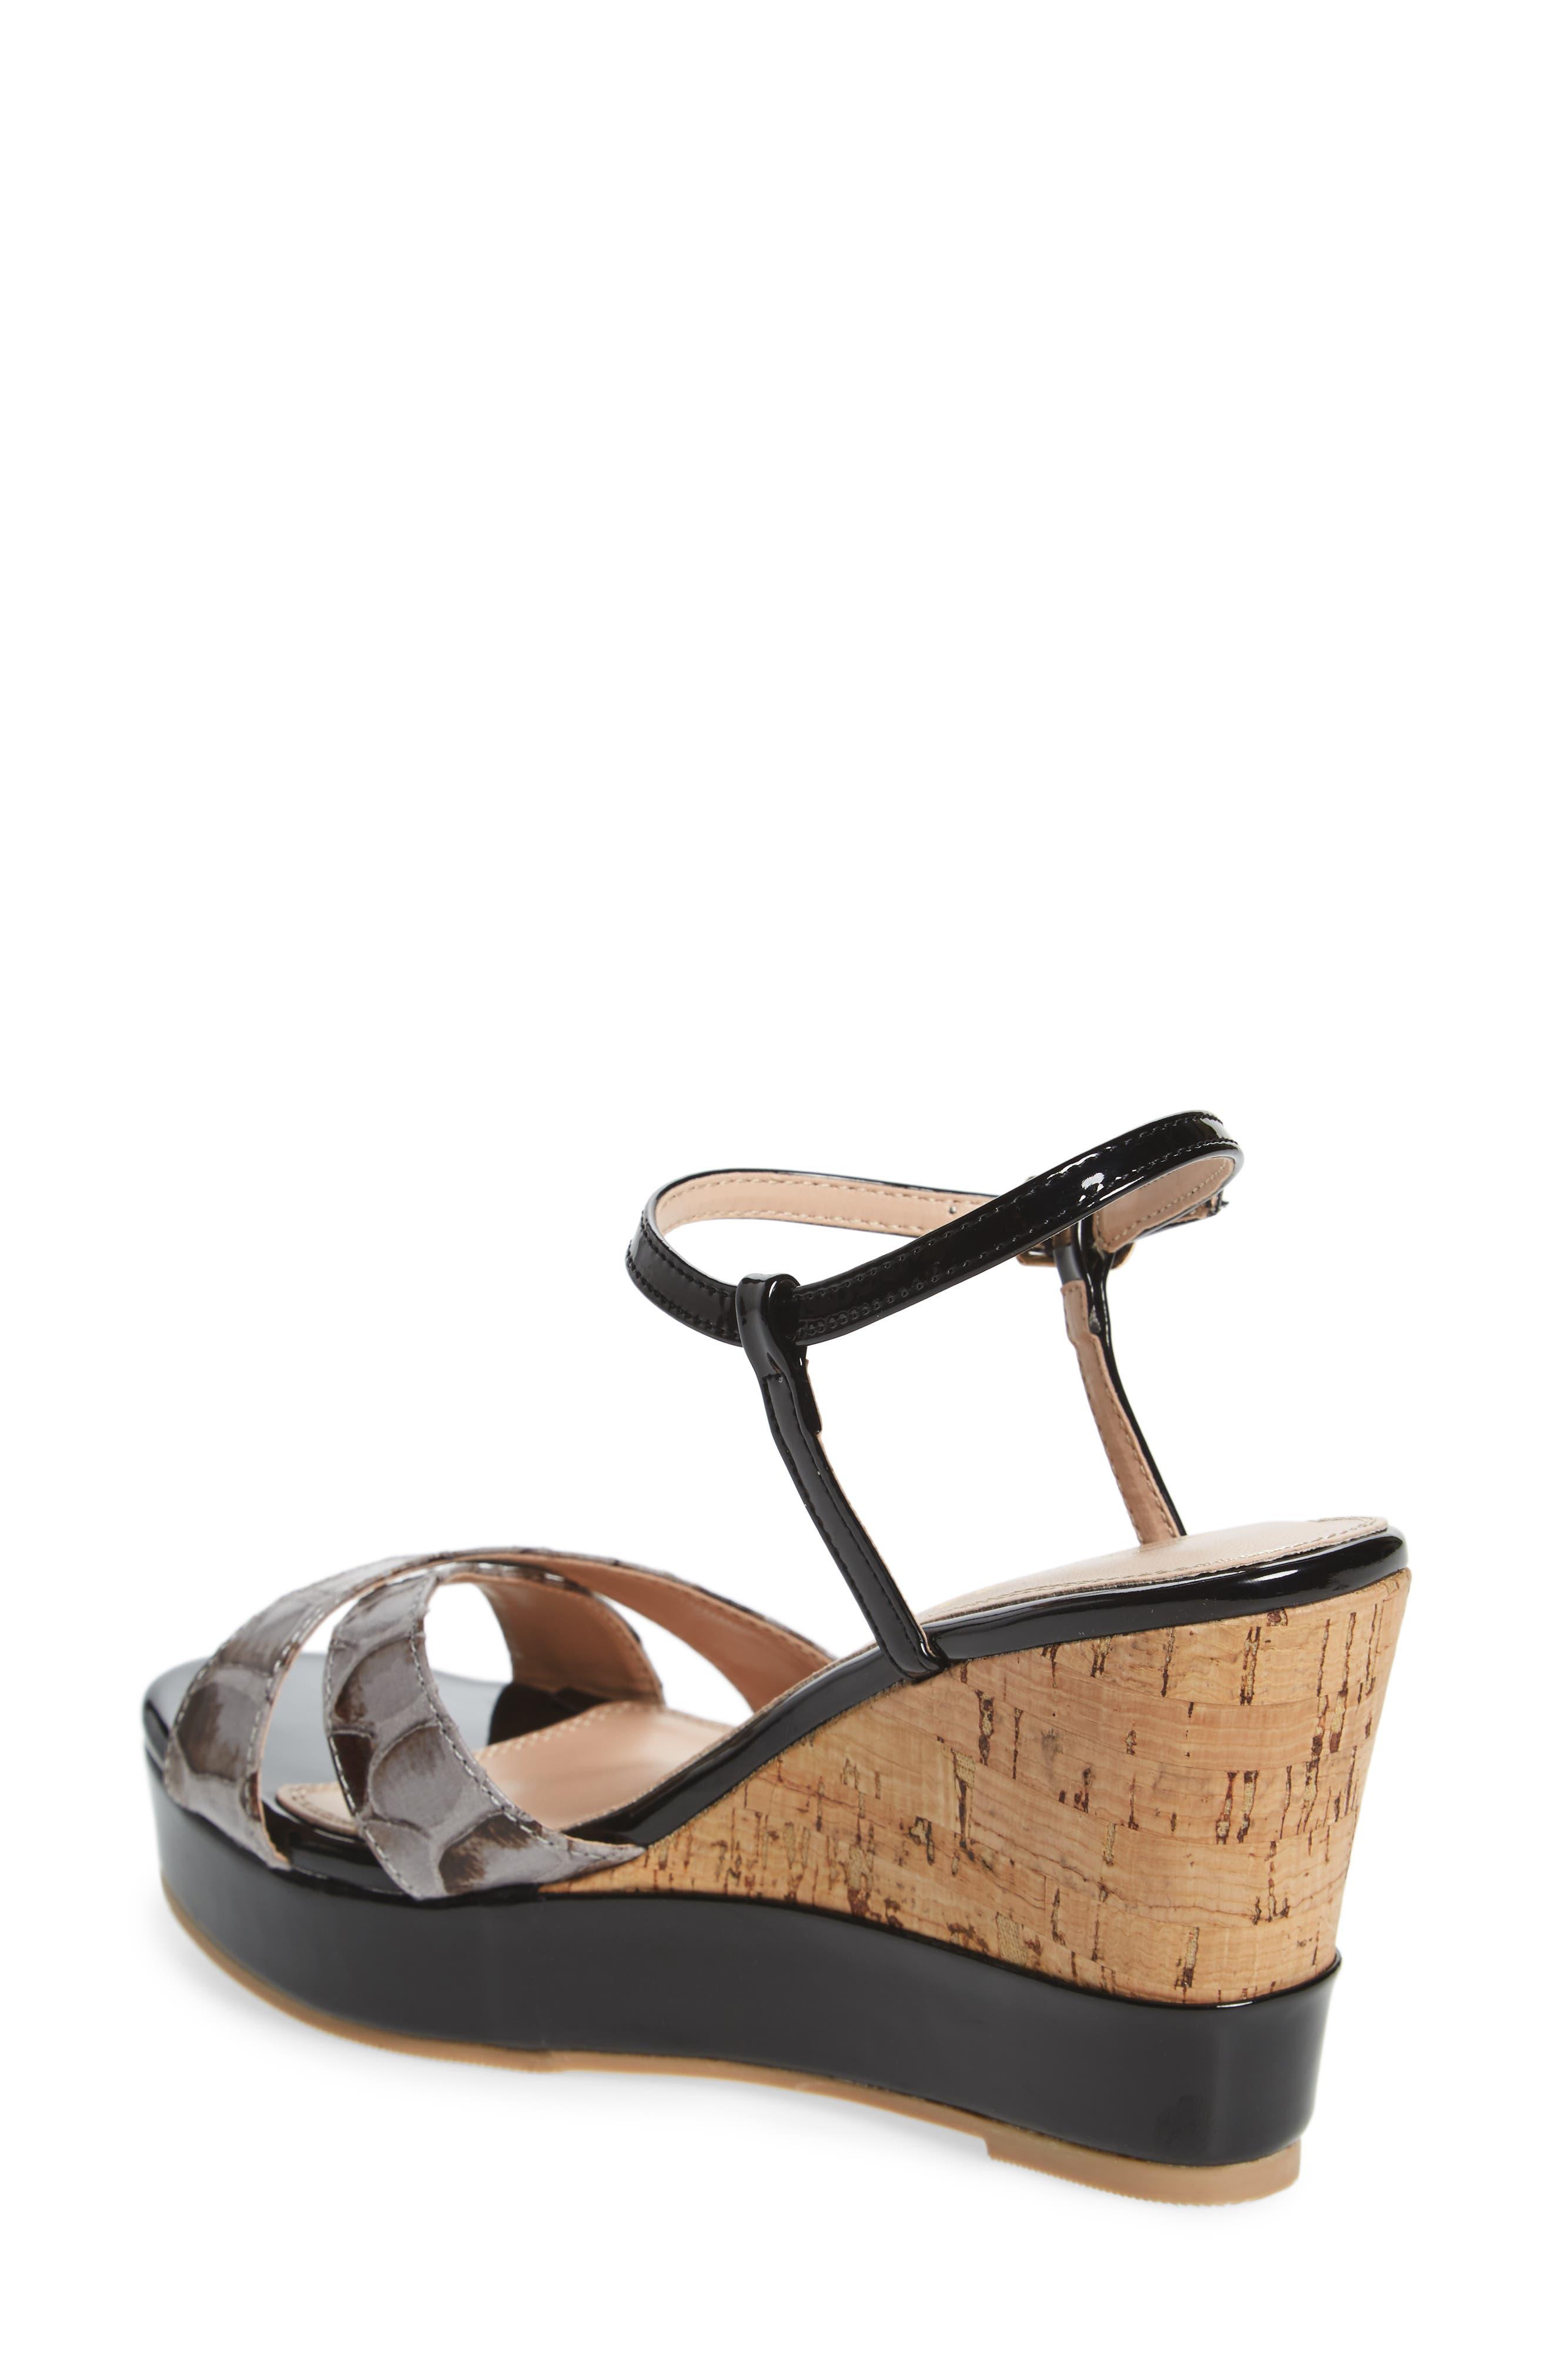 Lottie Platform Wedge Sandal,                             Alternate thumbnail 2, color,                             BLACK SYNTHETIC